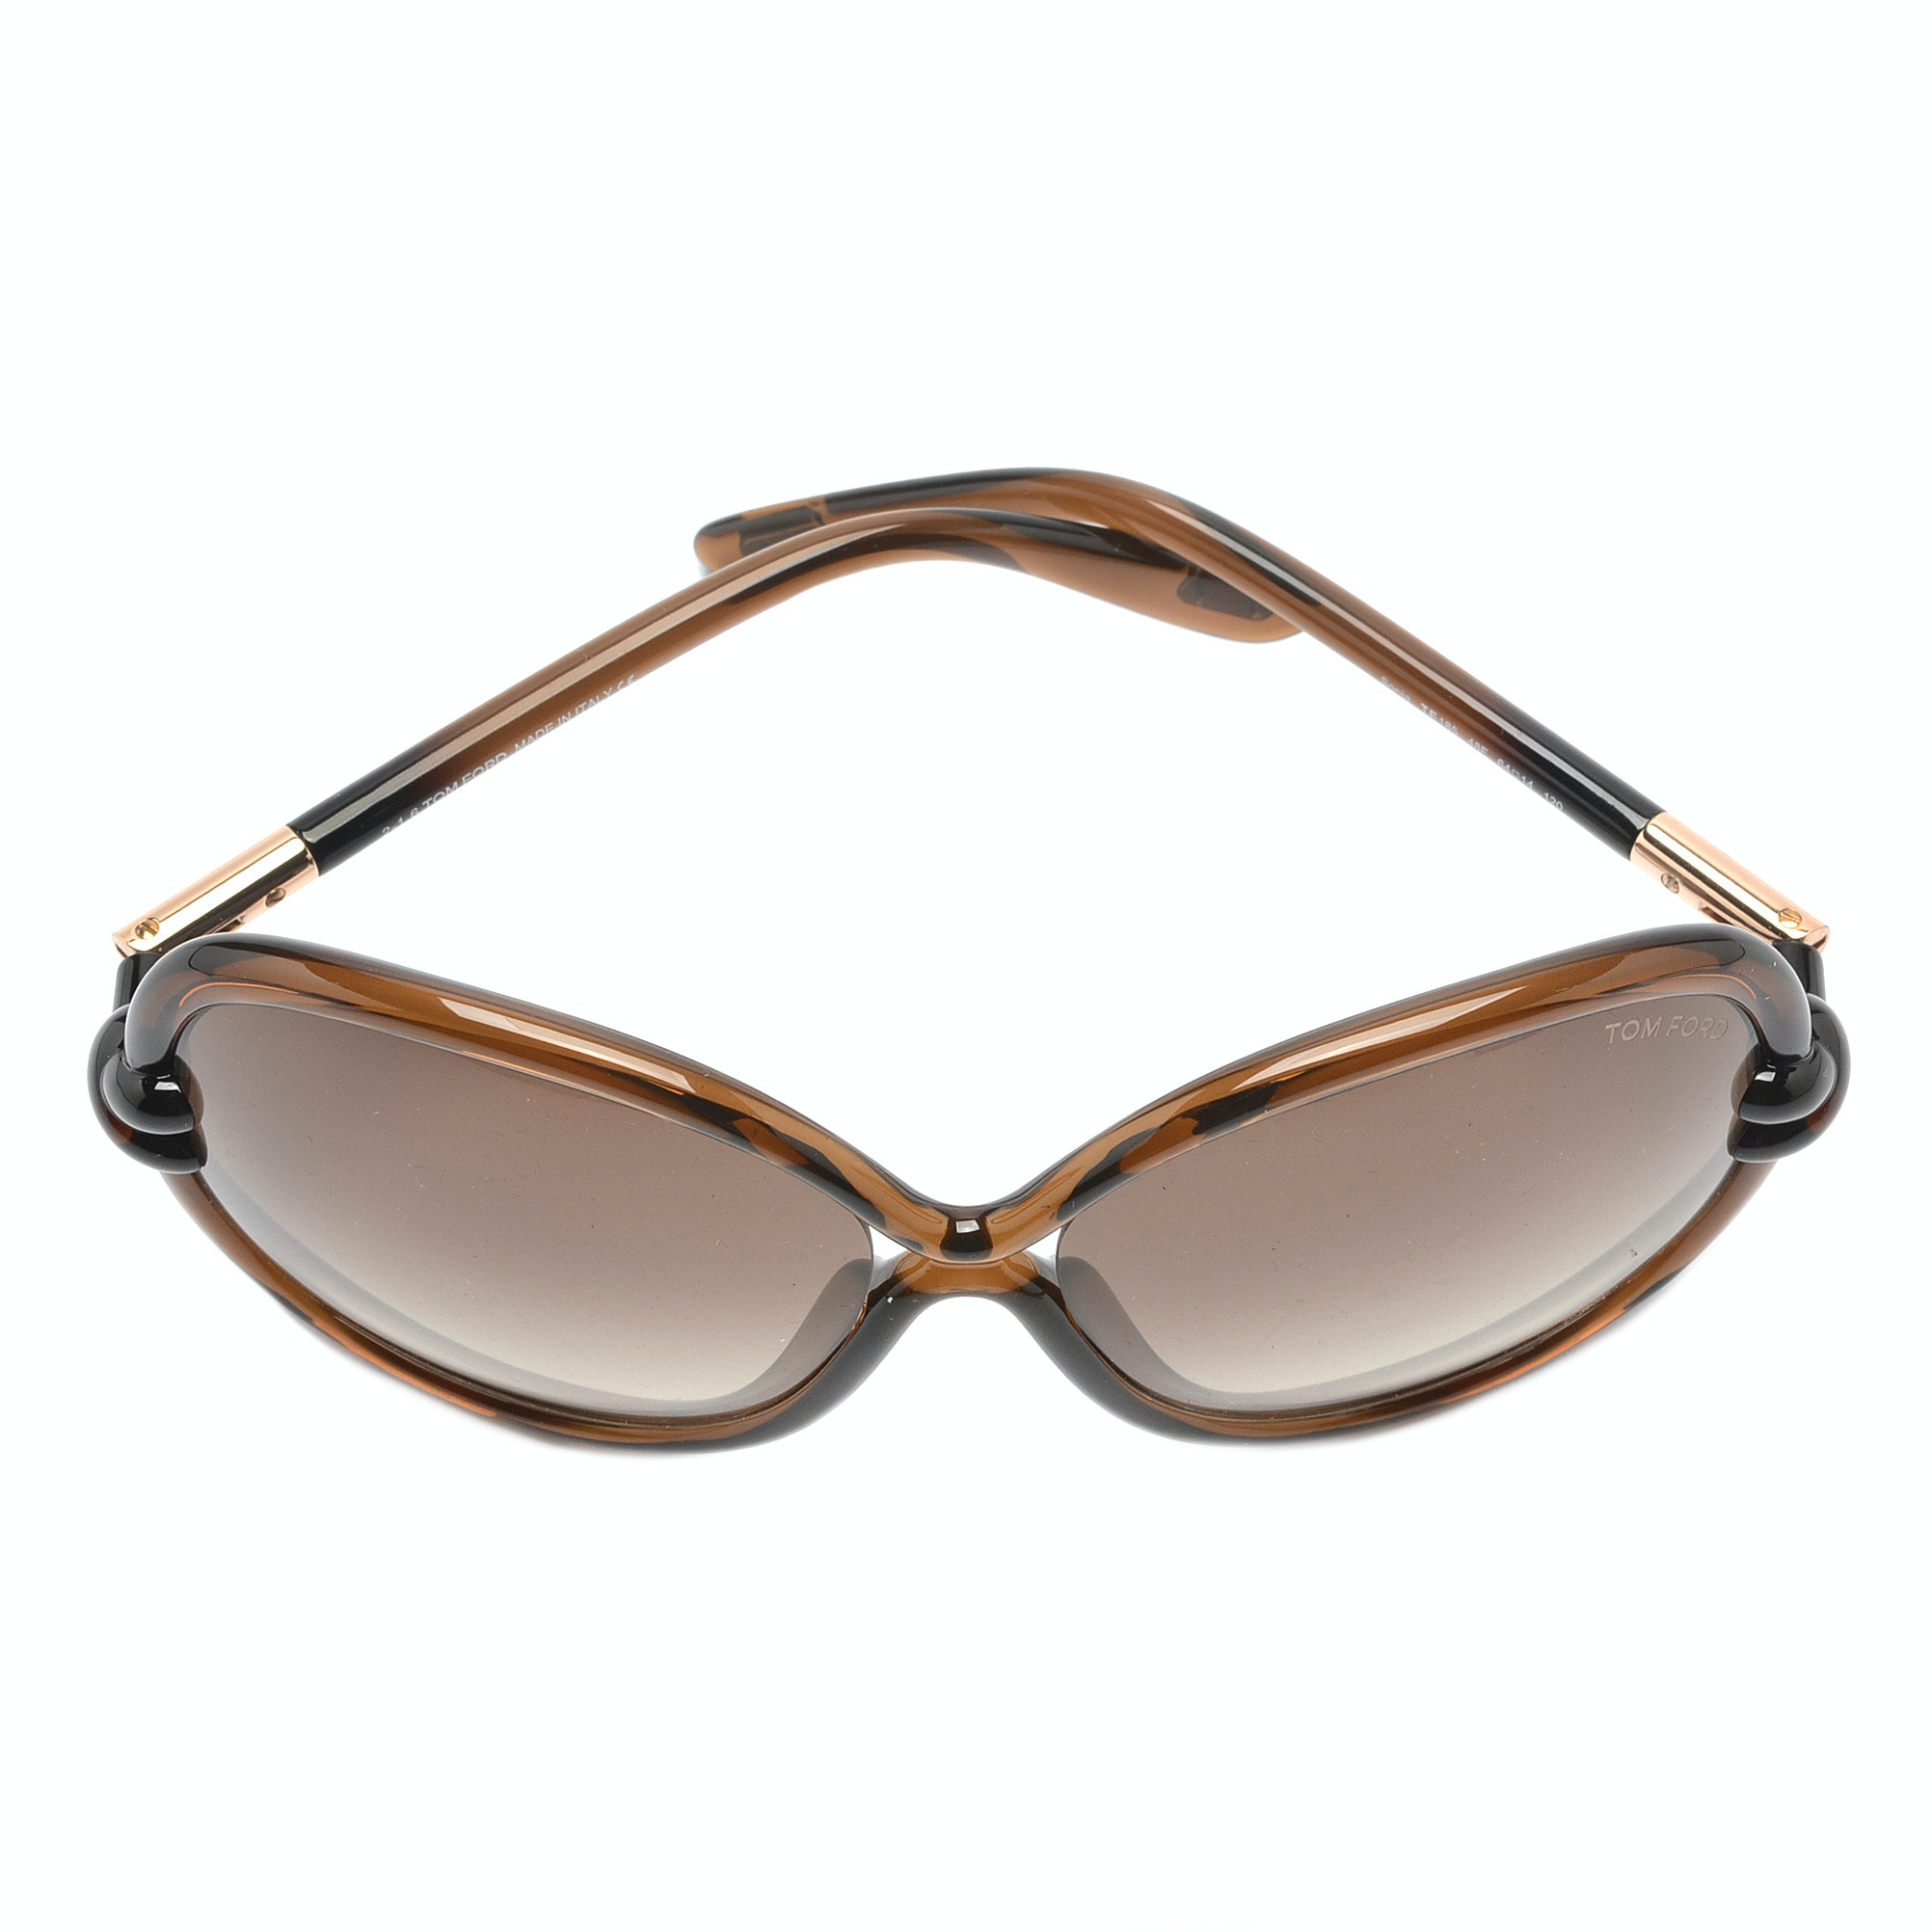 Tom Ford Sonja Oversized Round Sunglasses